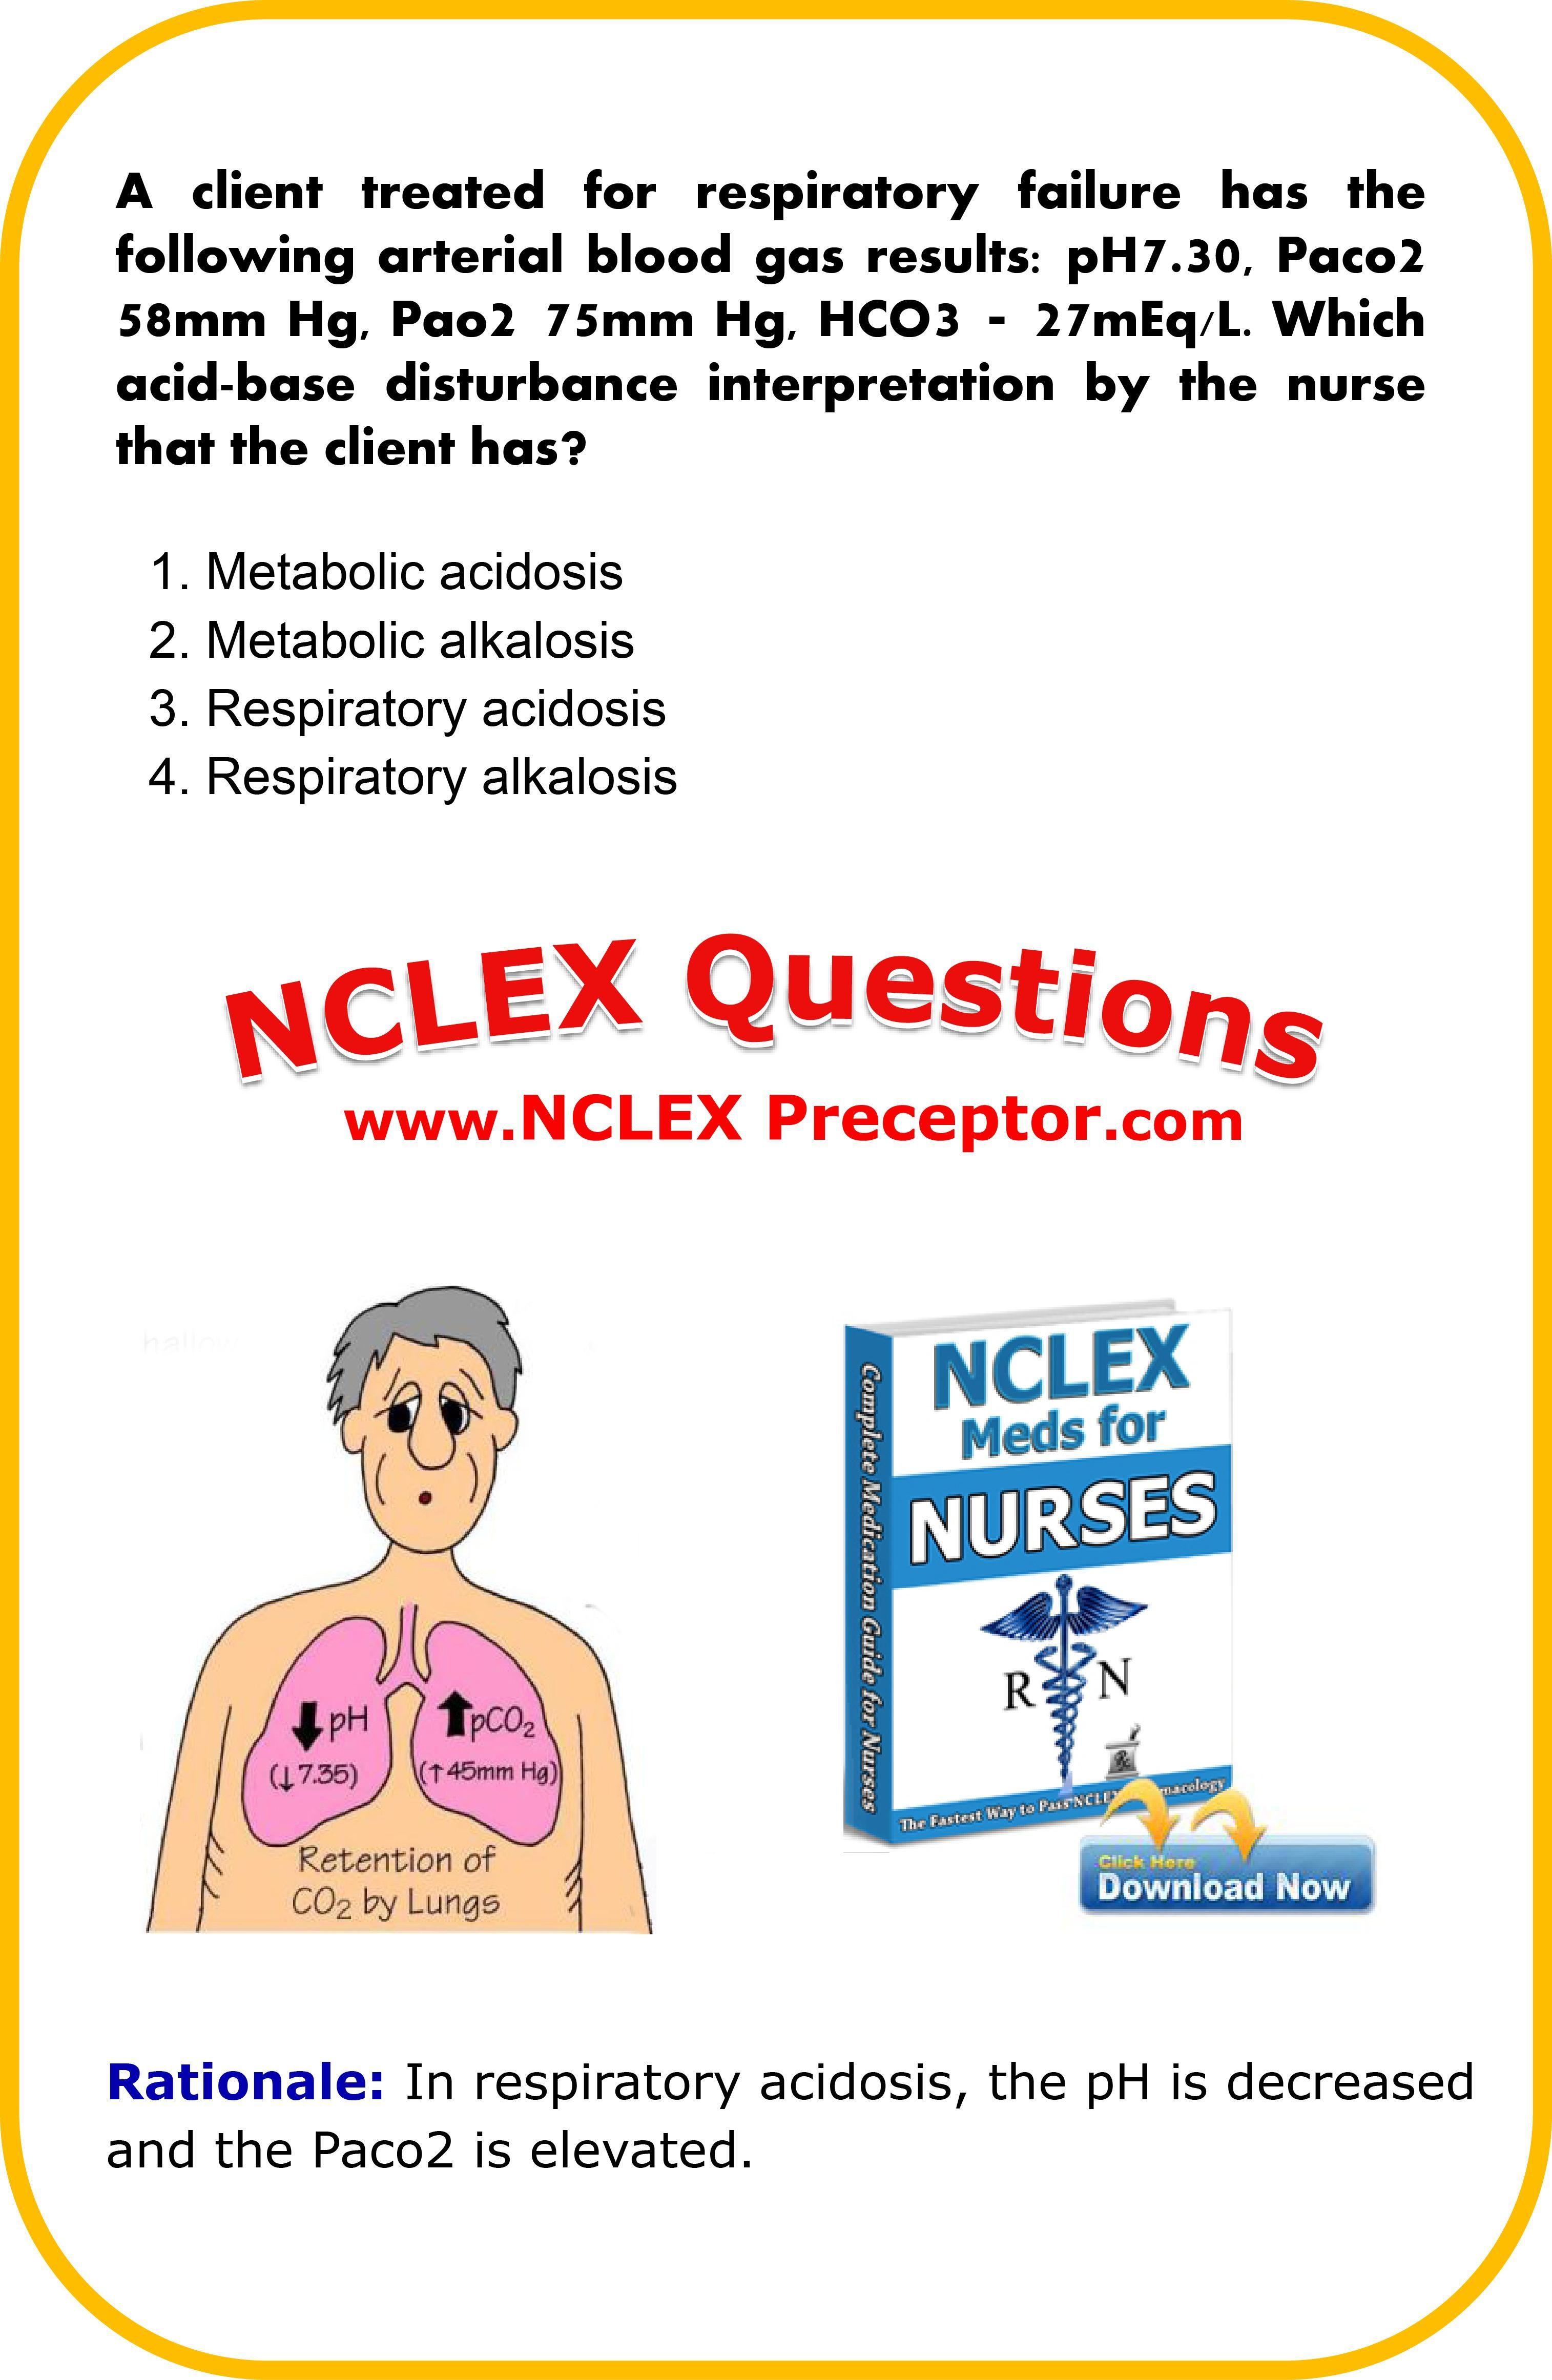 Free Nclex Tips For Registered Nurses Nursing Healthcare Tips To Pass Nclex Nclexcoremeasures